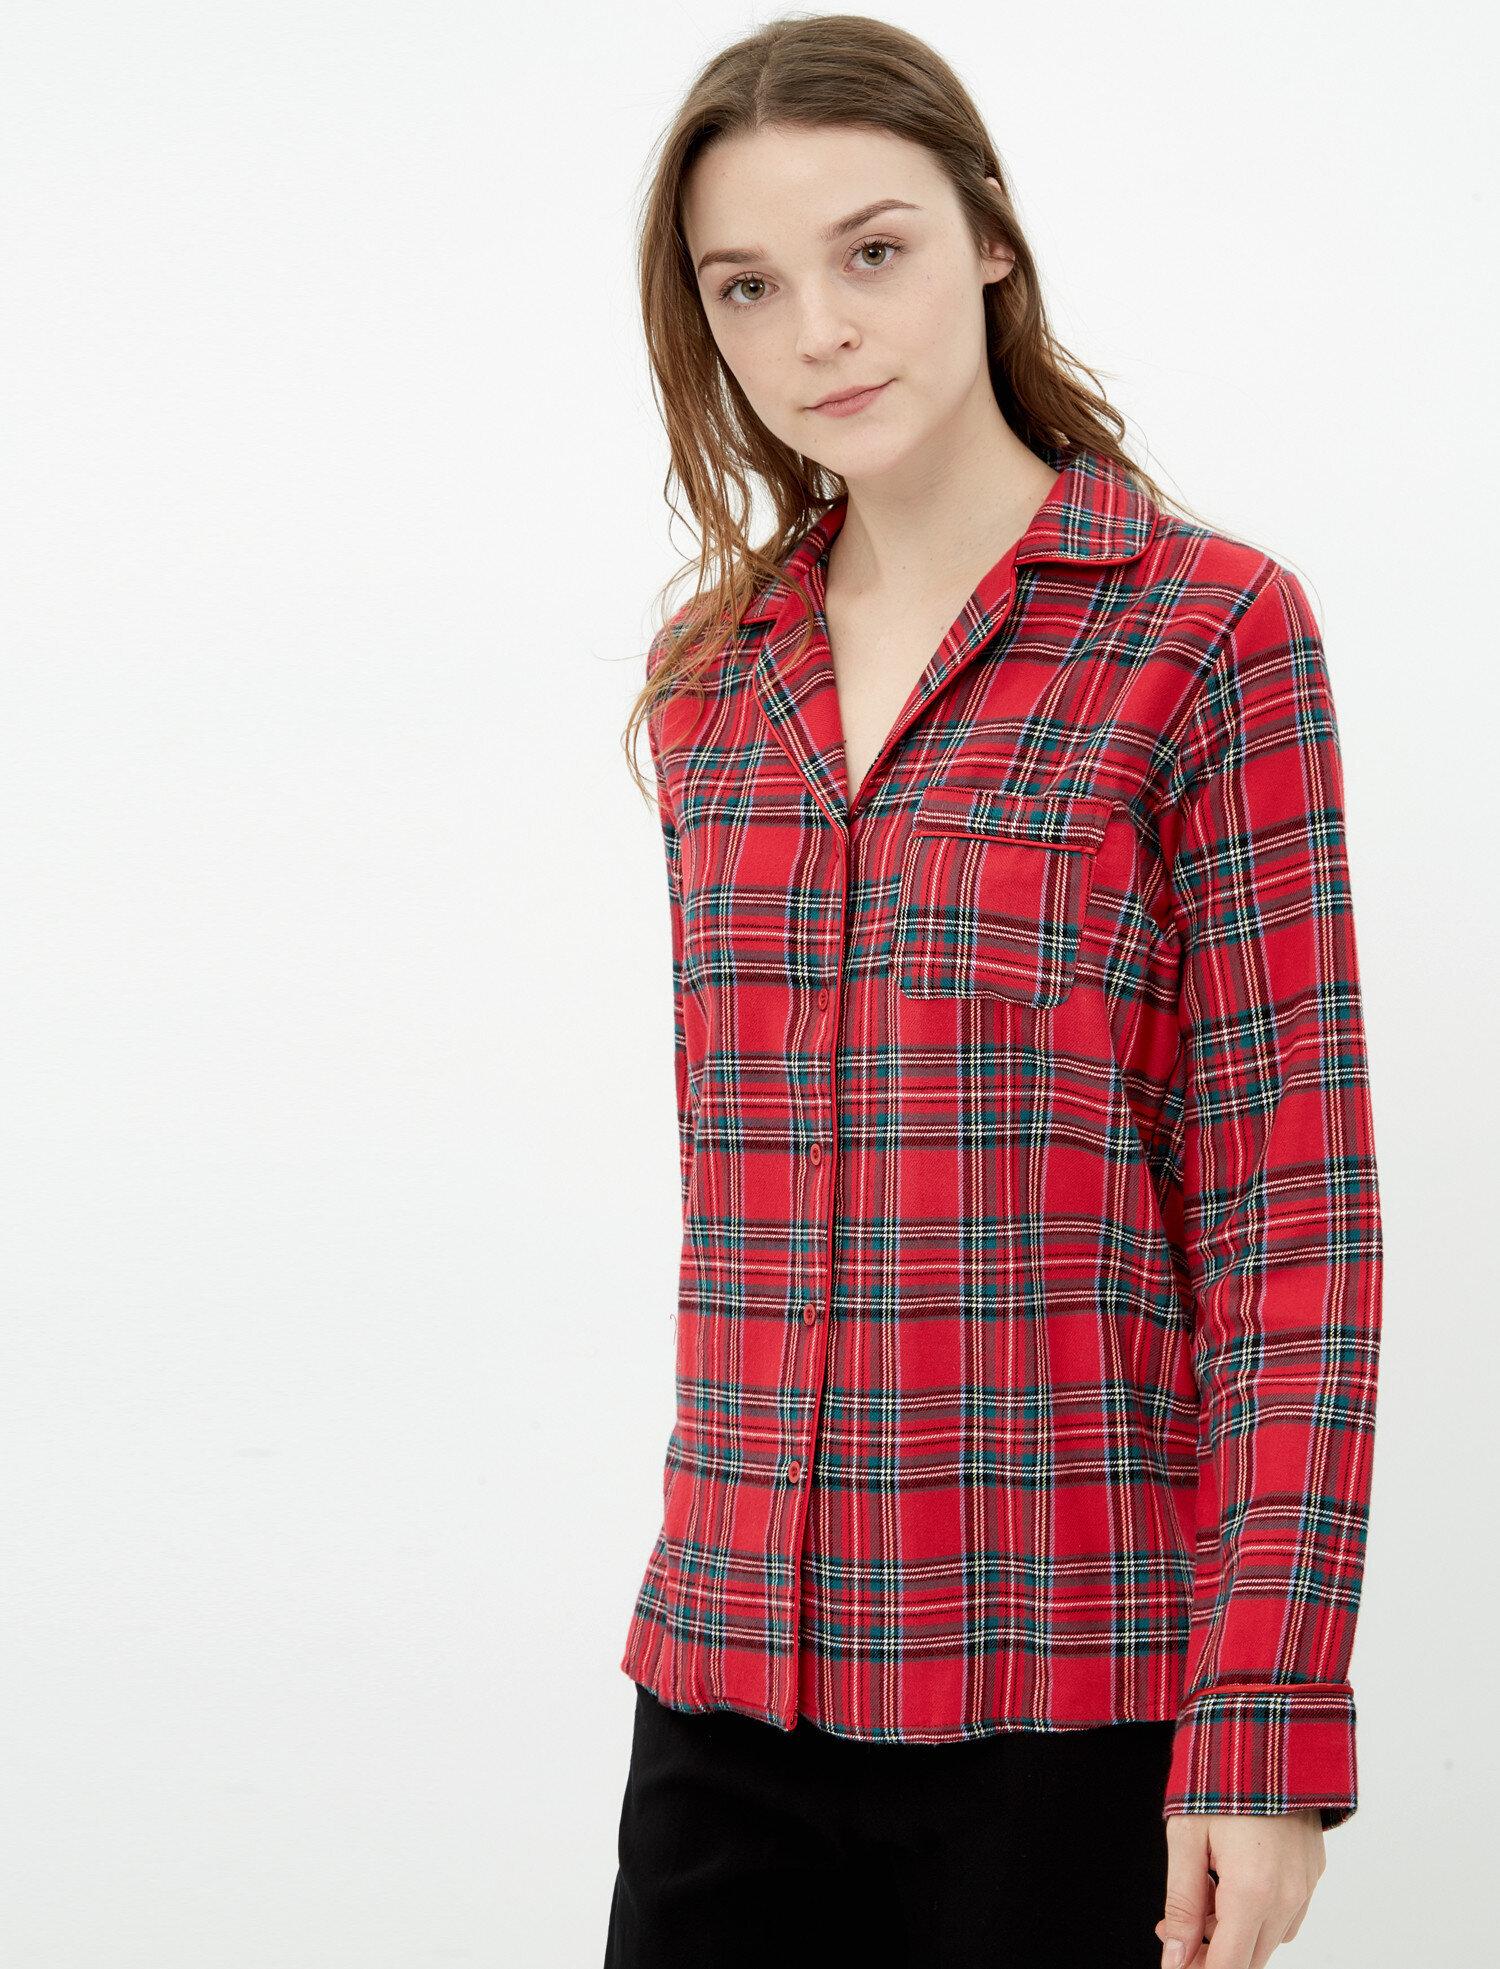 1b8aab96ab31f Kırmızı Bayan Kareli Pijama 7KLK73821OW12U   Koton